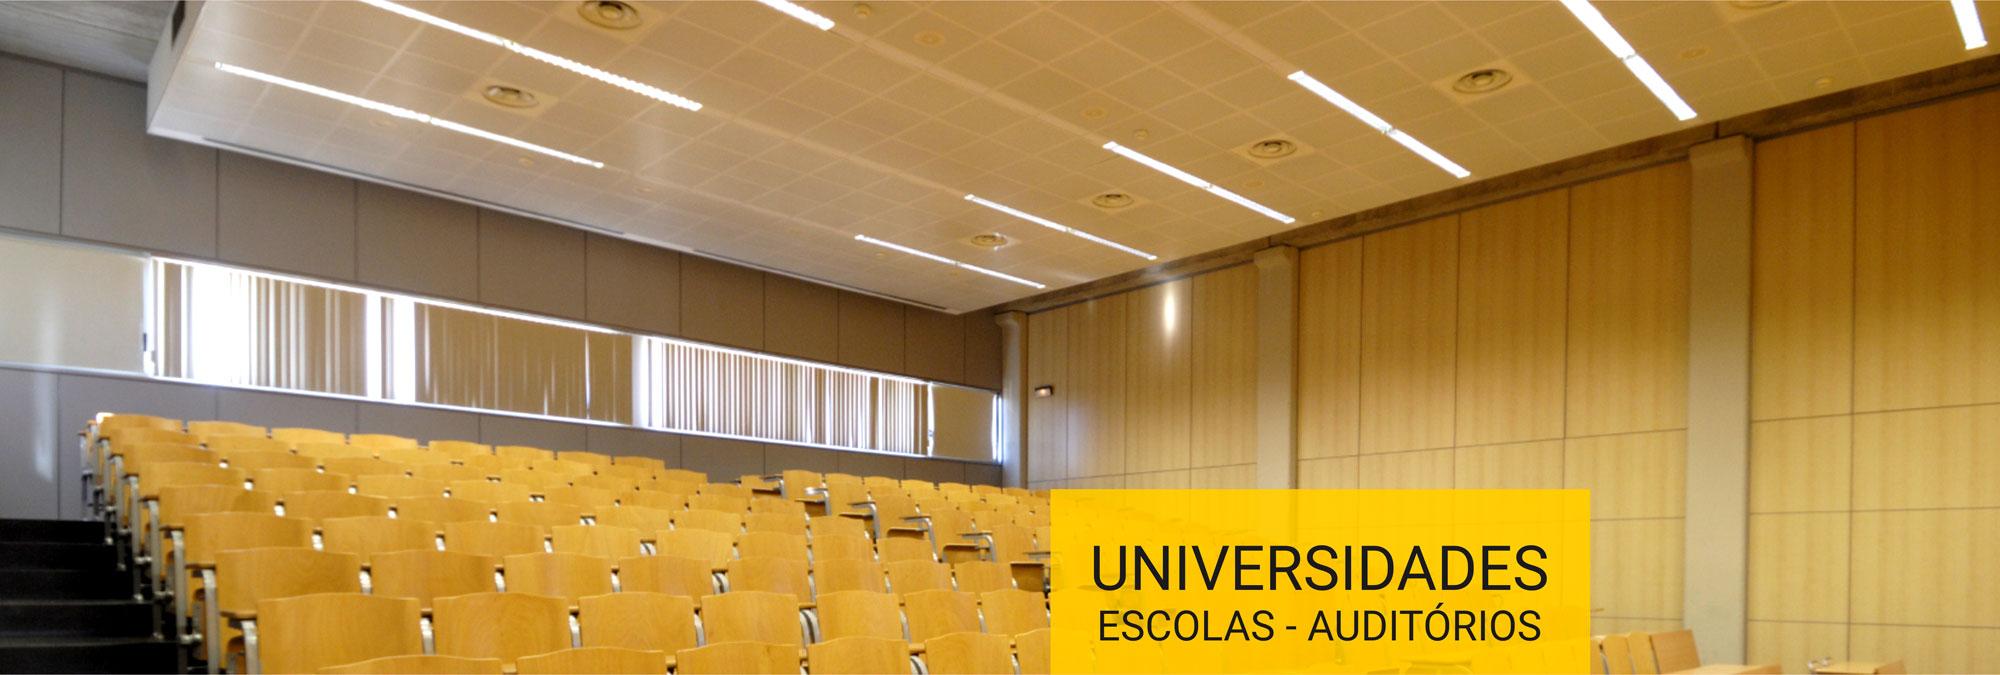 Universidades O2Led